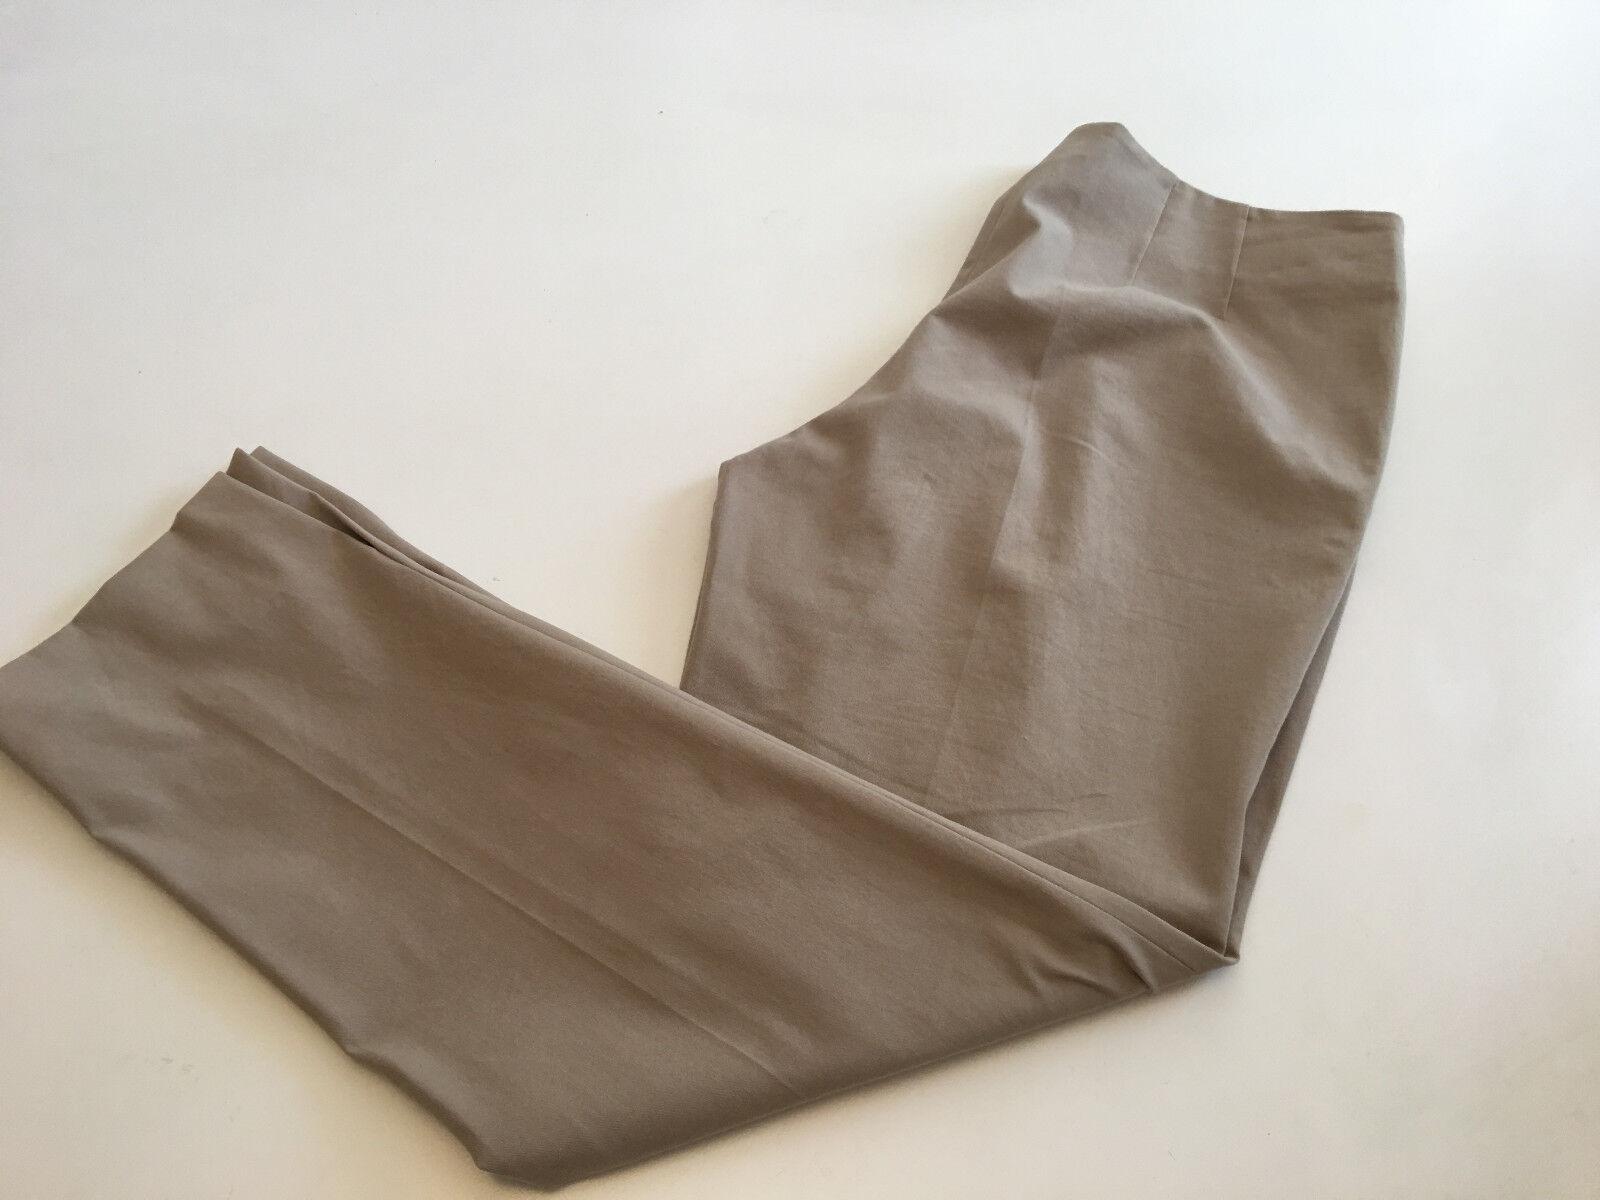 Auth. RIVAMONTI Brunello Cucinelli Cotton Twill Flat Front Slim Pants sz 14